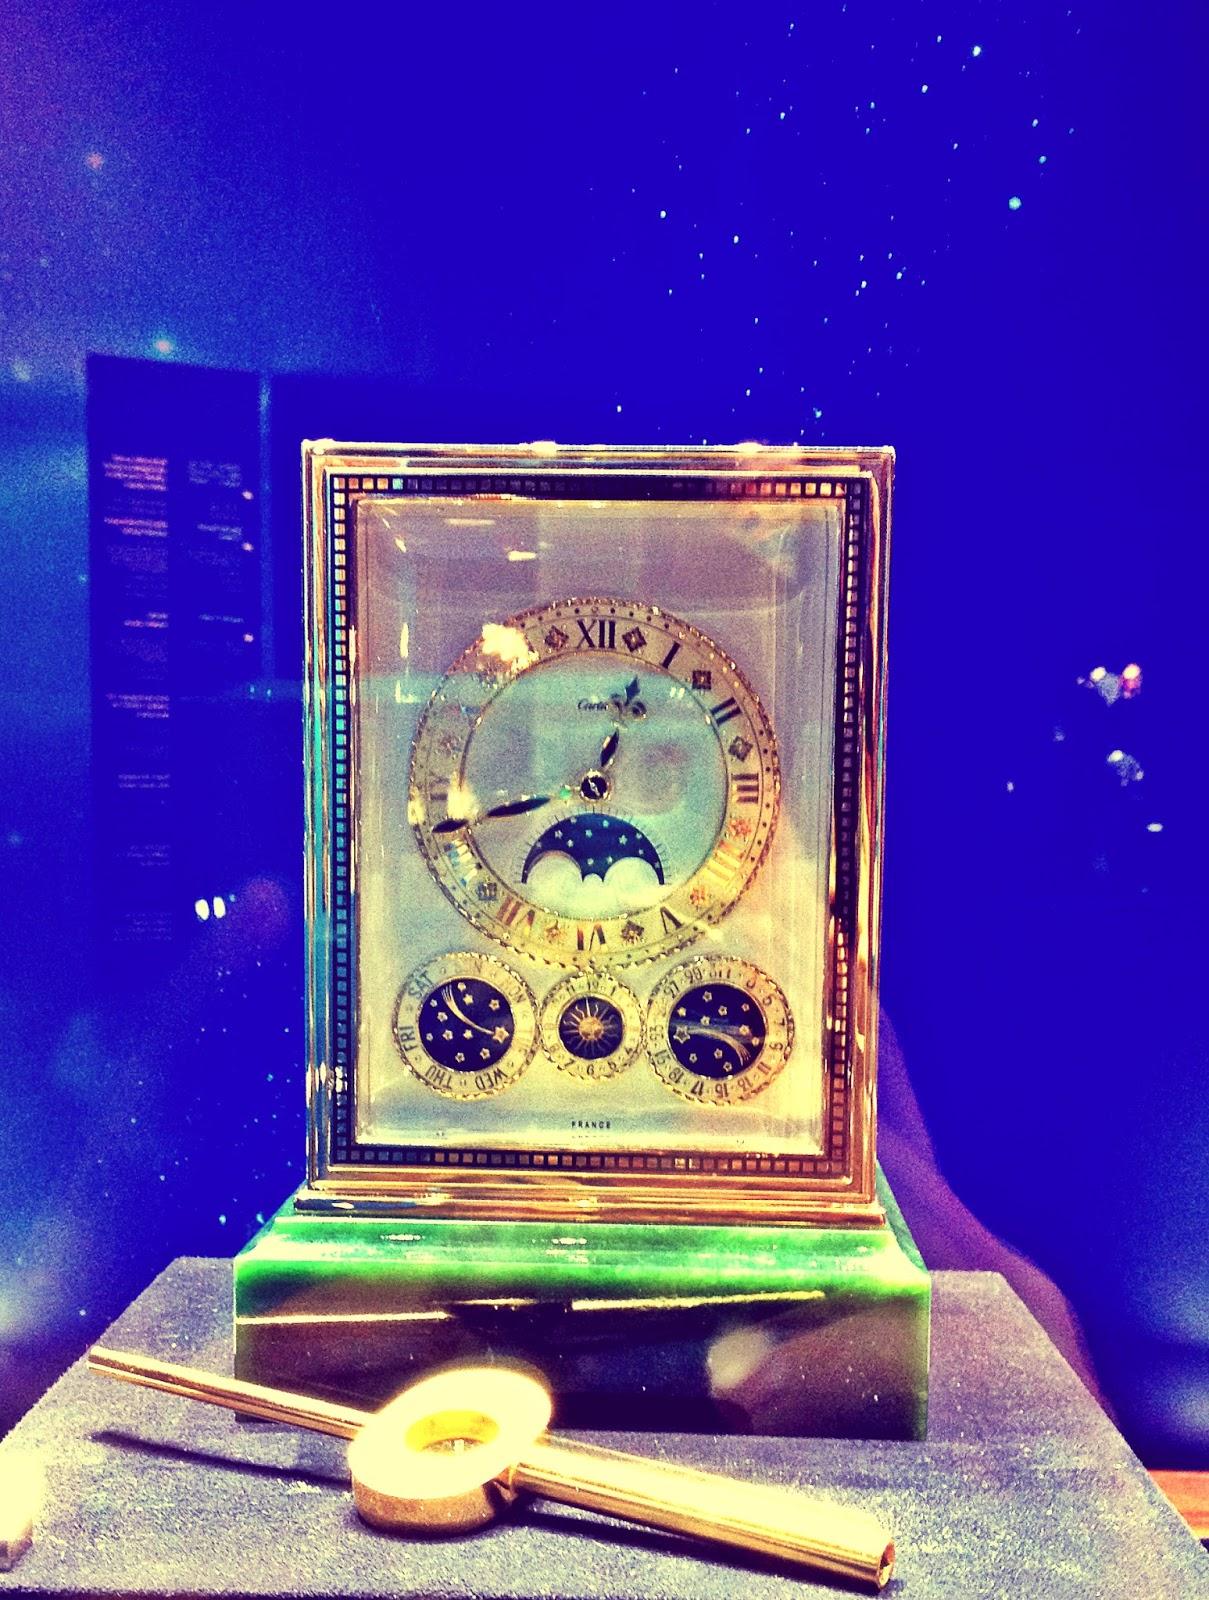 hong kong, hk, yiwei lim, yi wei lim, yi wei lim, yiwei lim blog, watches & wonders, haute horlogerie, watches & wonders hong kong, petit sonnerie